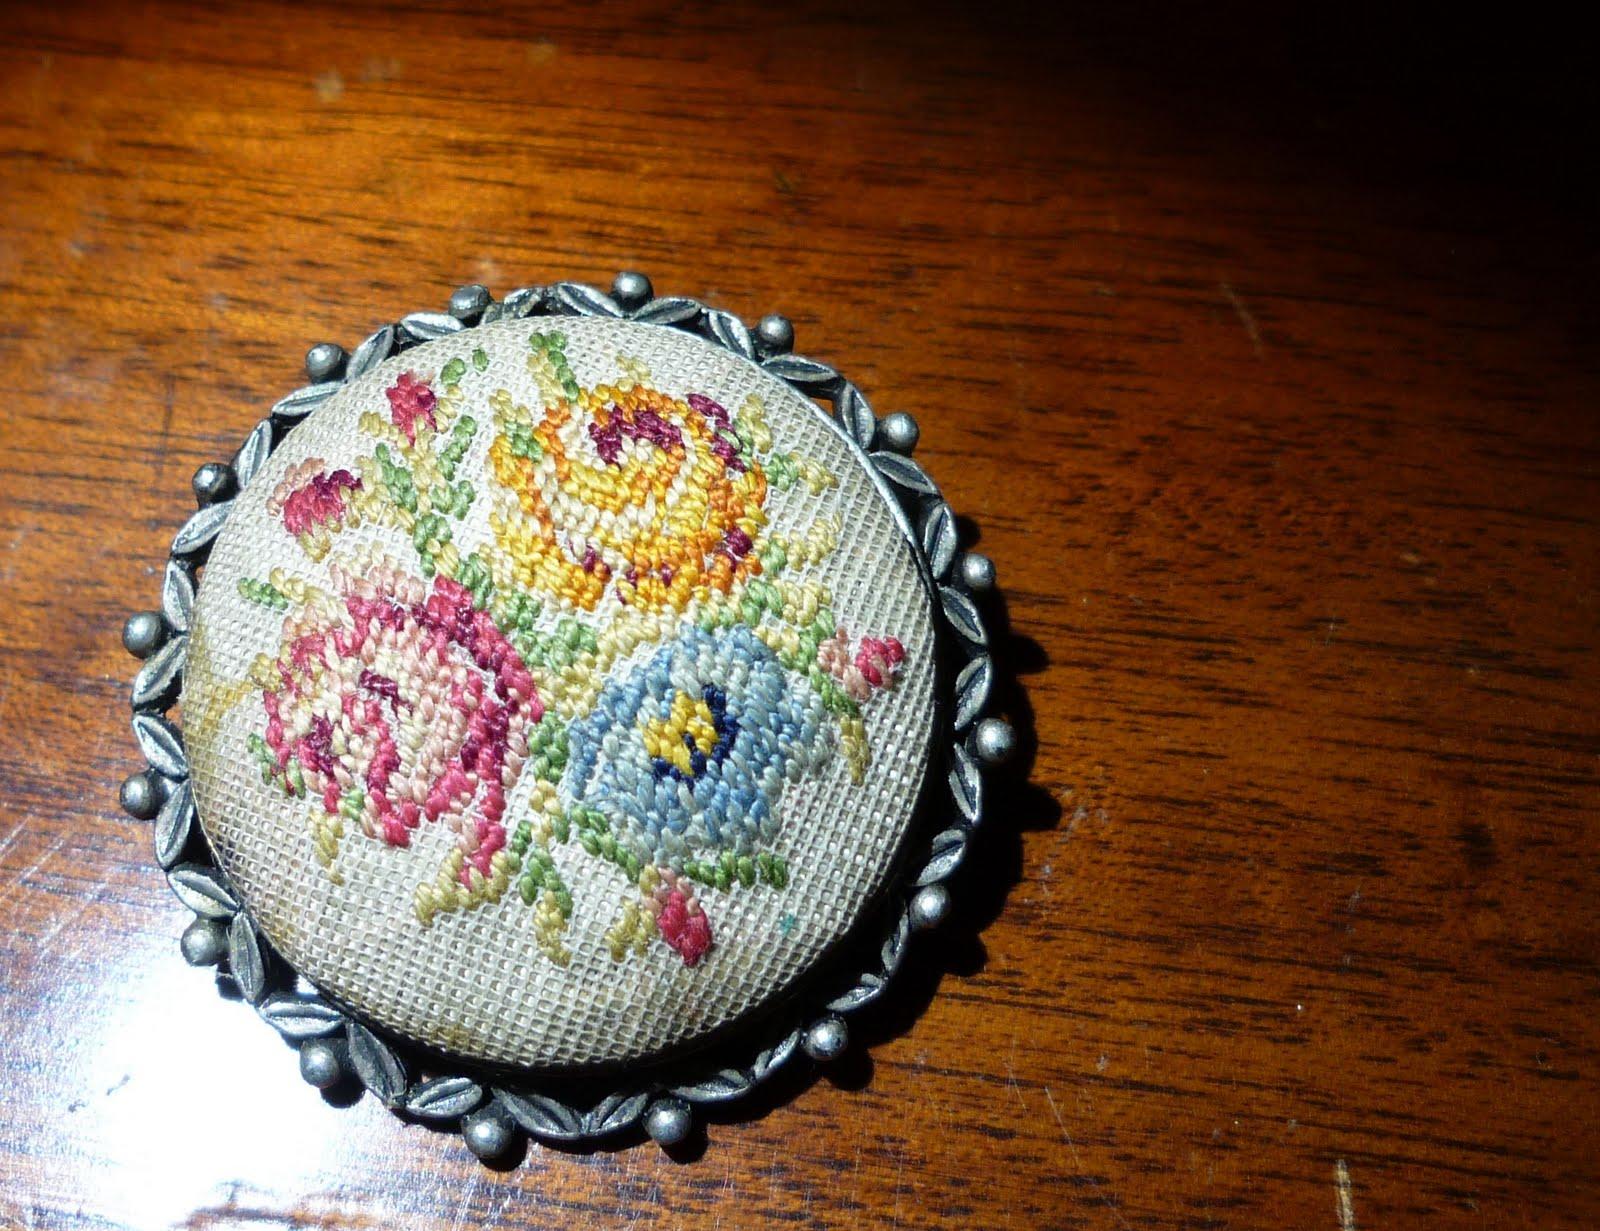 The Geeky Goblin: Rose brooch cross stitch pattern